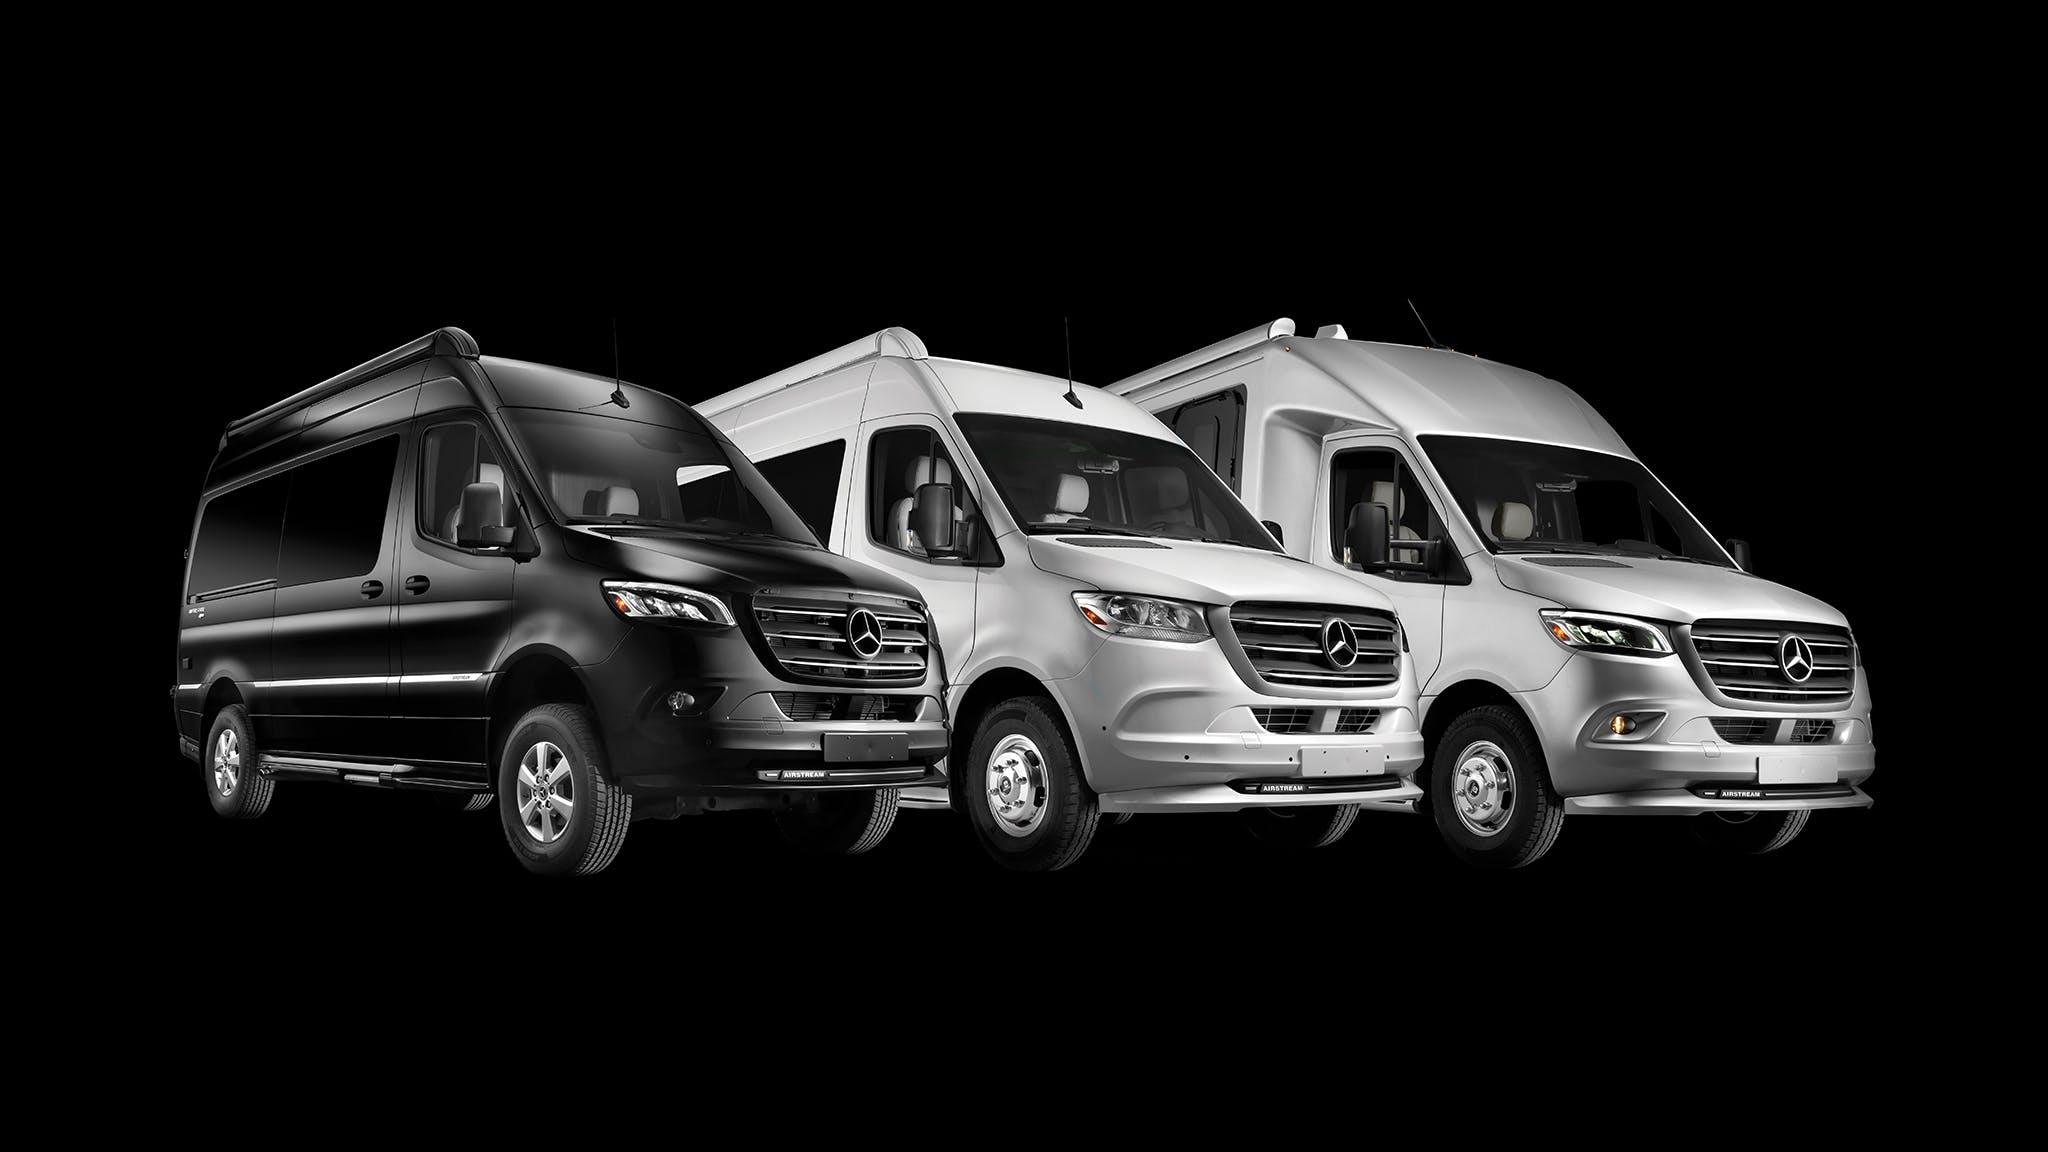 Airstream-Touring-Coaches-Comfort-and-Luxury-Travel-Header-1